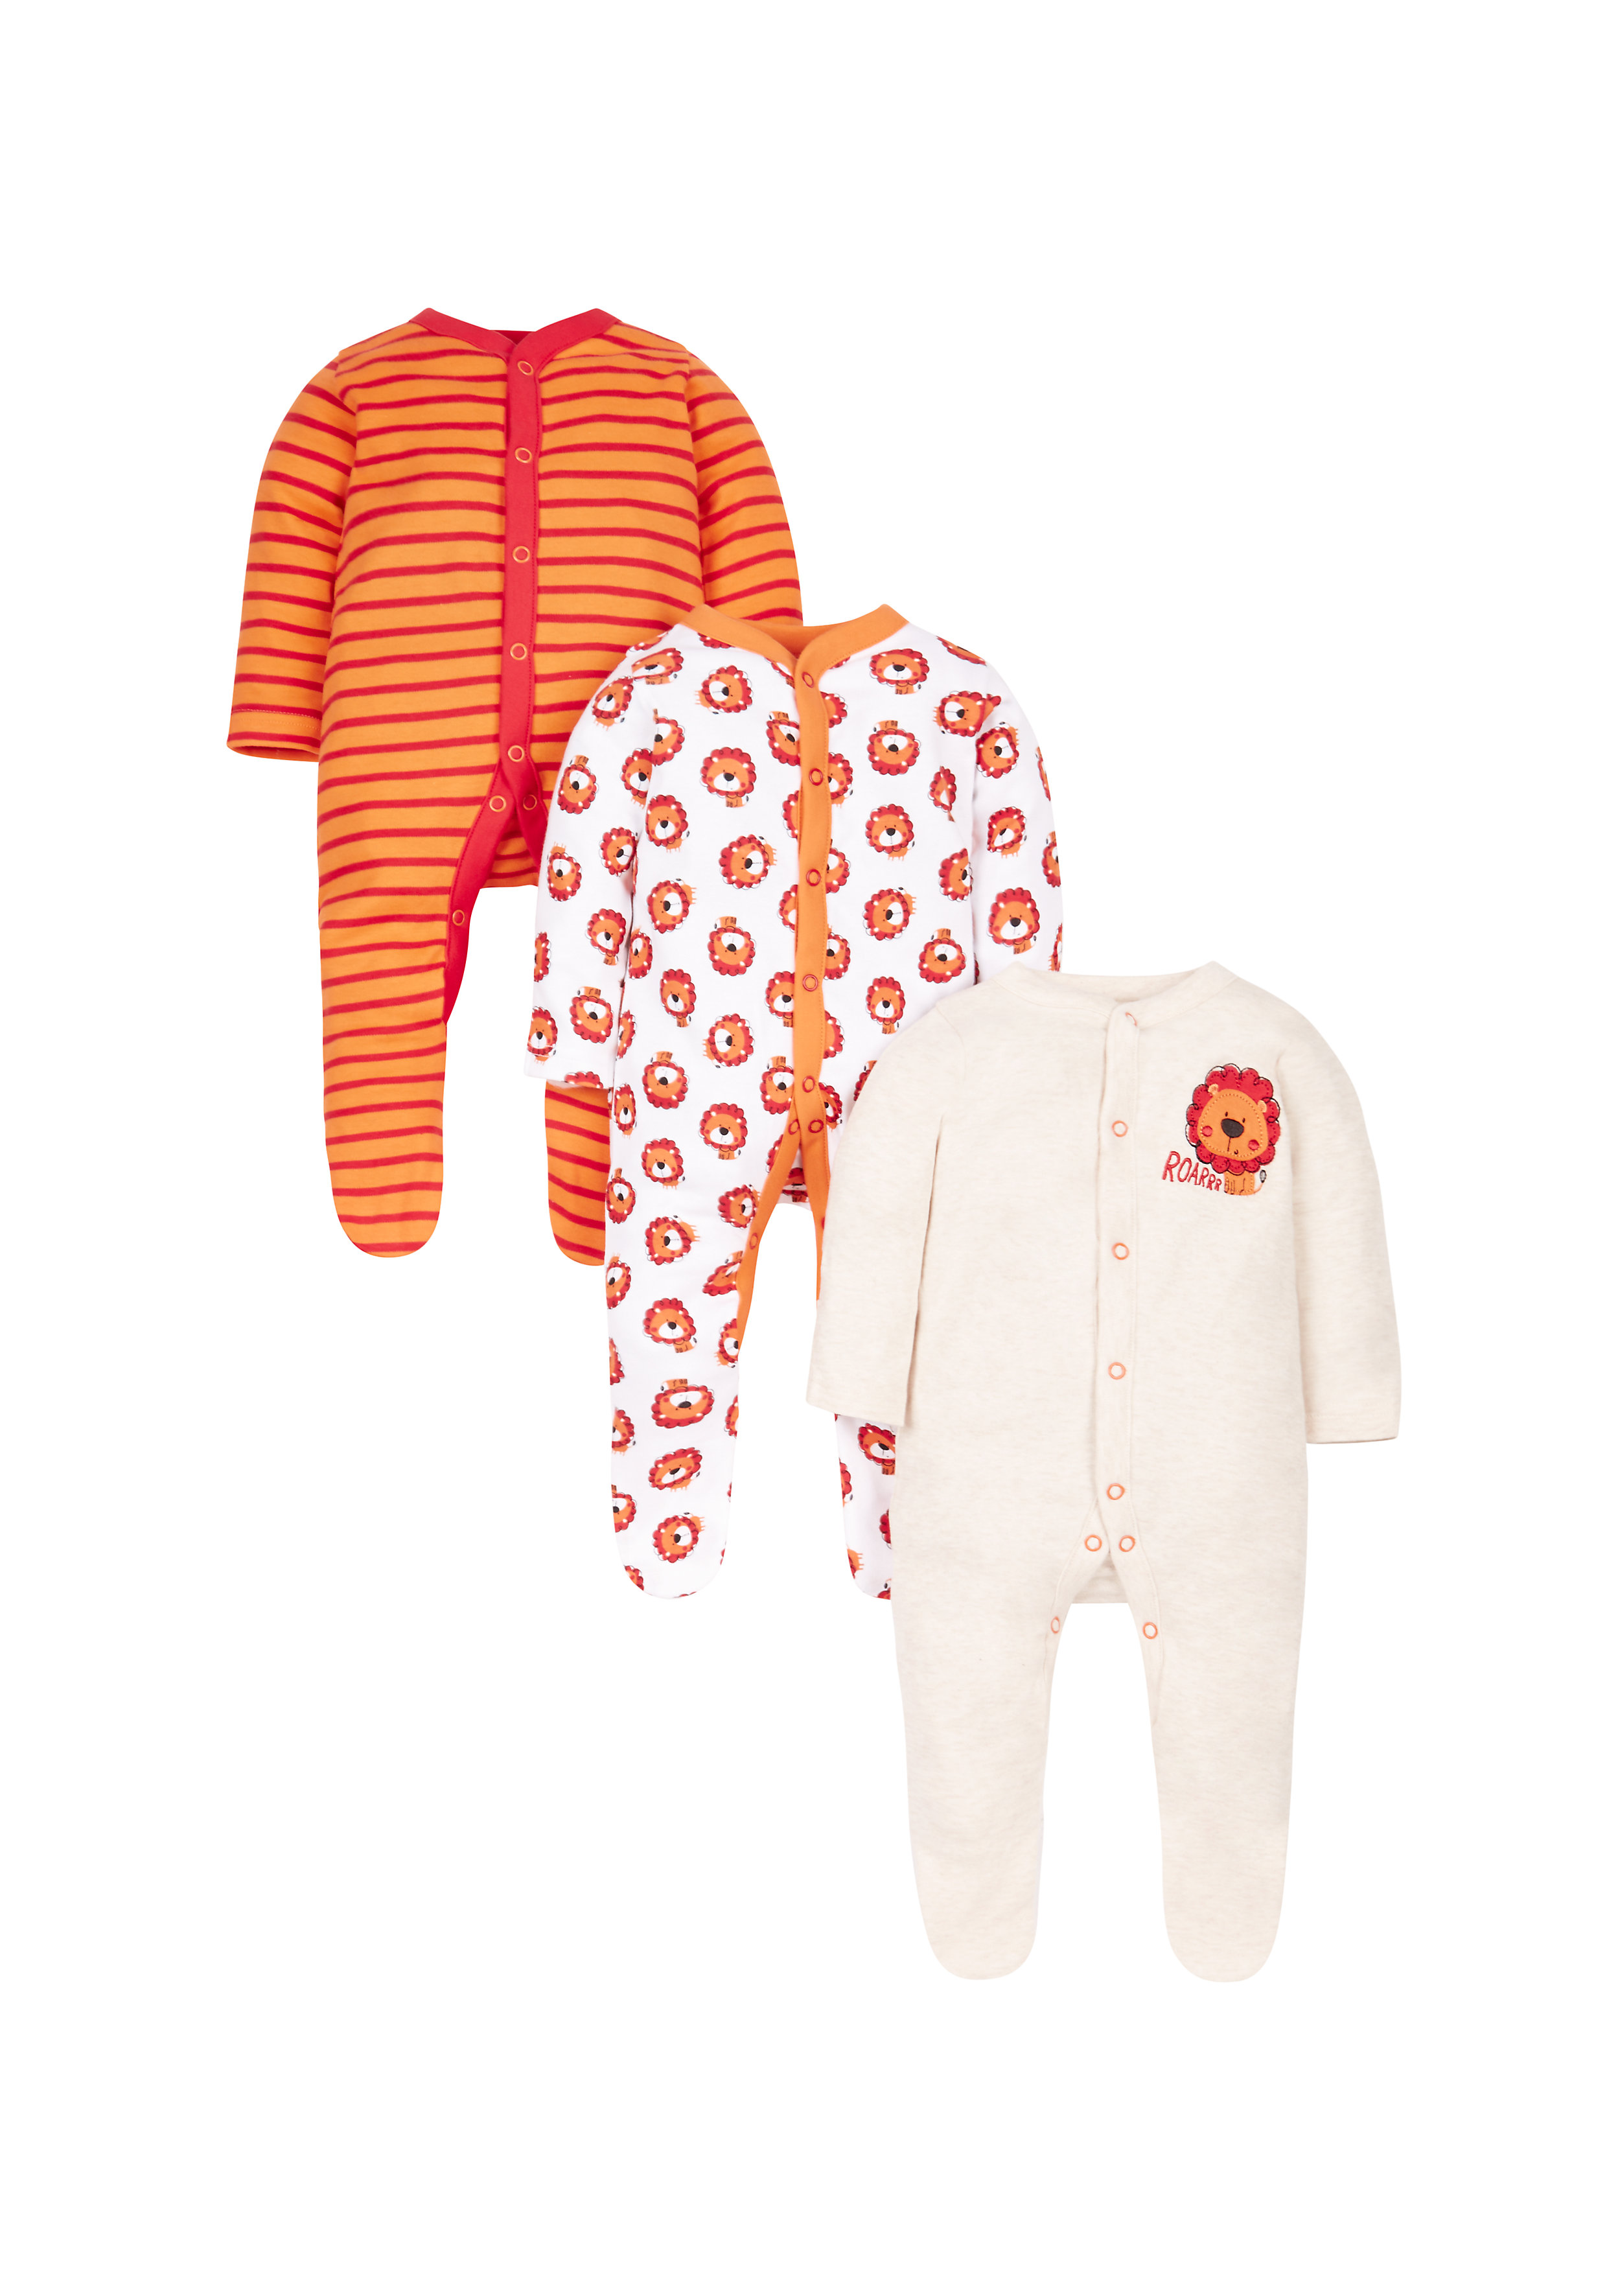 Mothercare | Boys Little Lion Sleepsuits - Pack Of 3 - Orange